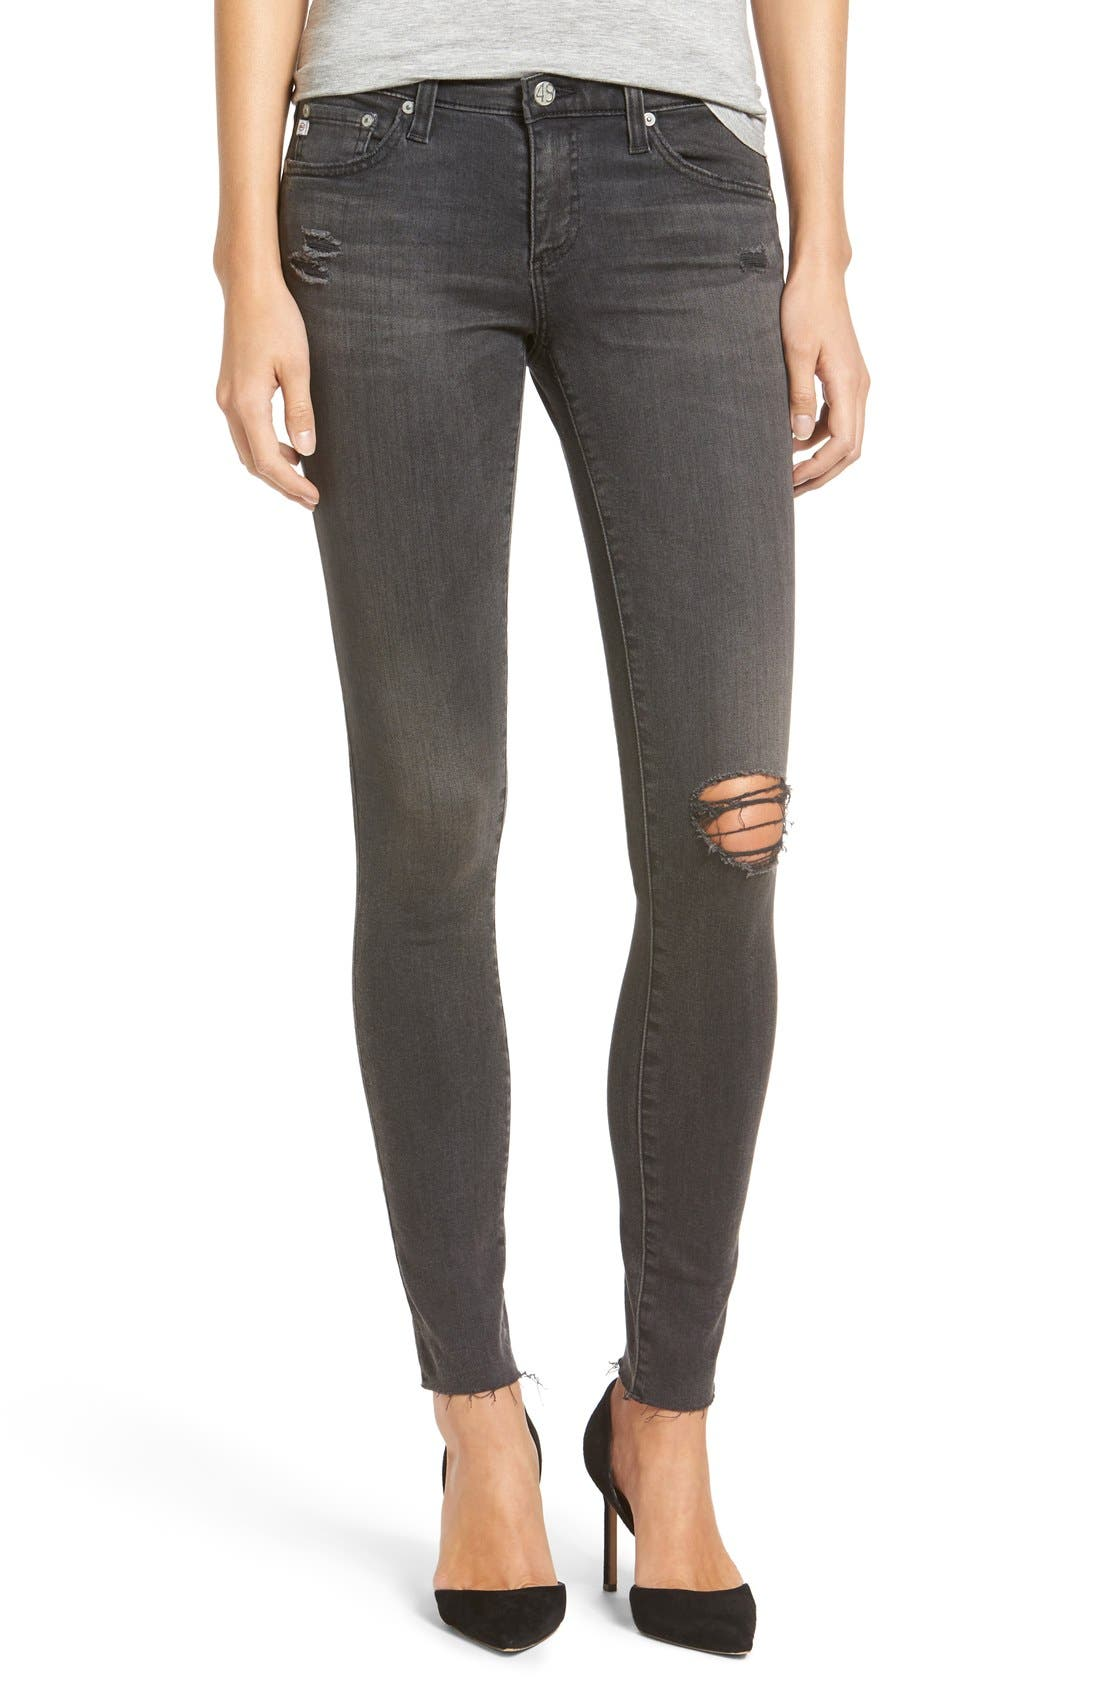 AG The Legging Ripped Super Skinny Jeans